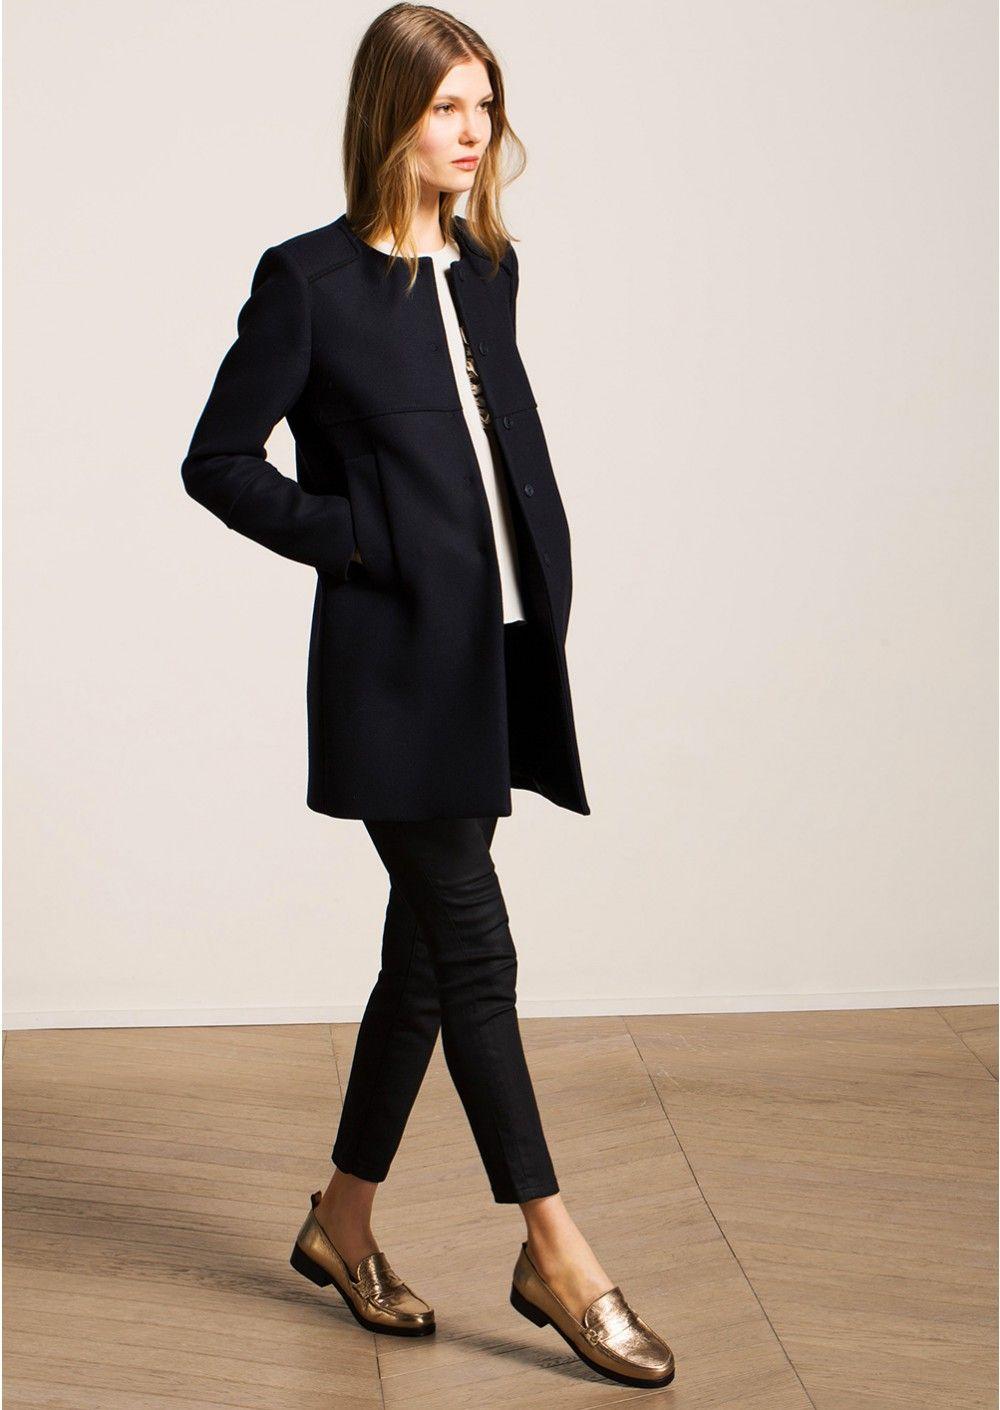 manteau laine noir tara jarmon